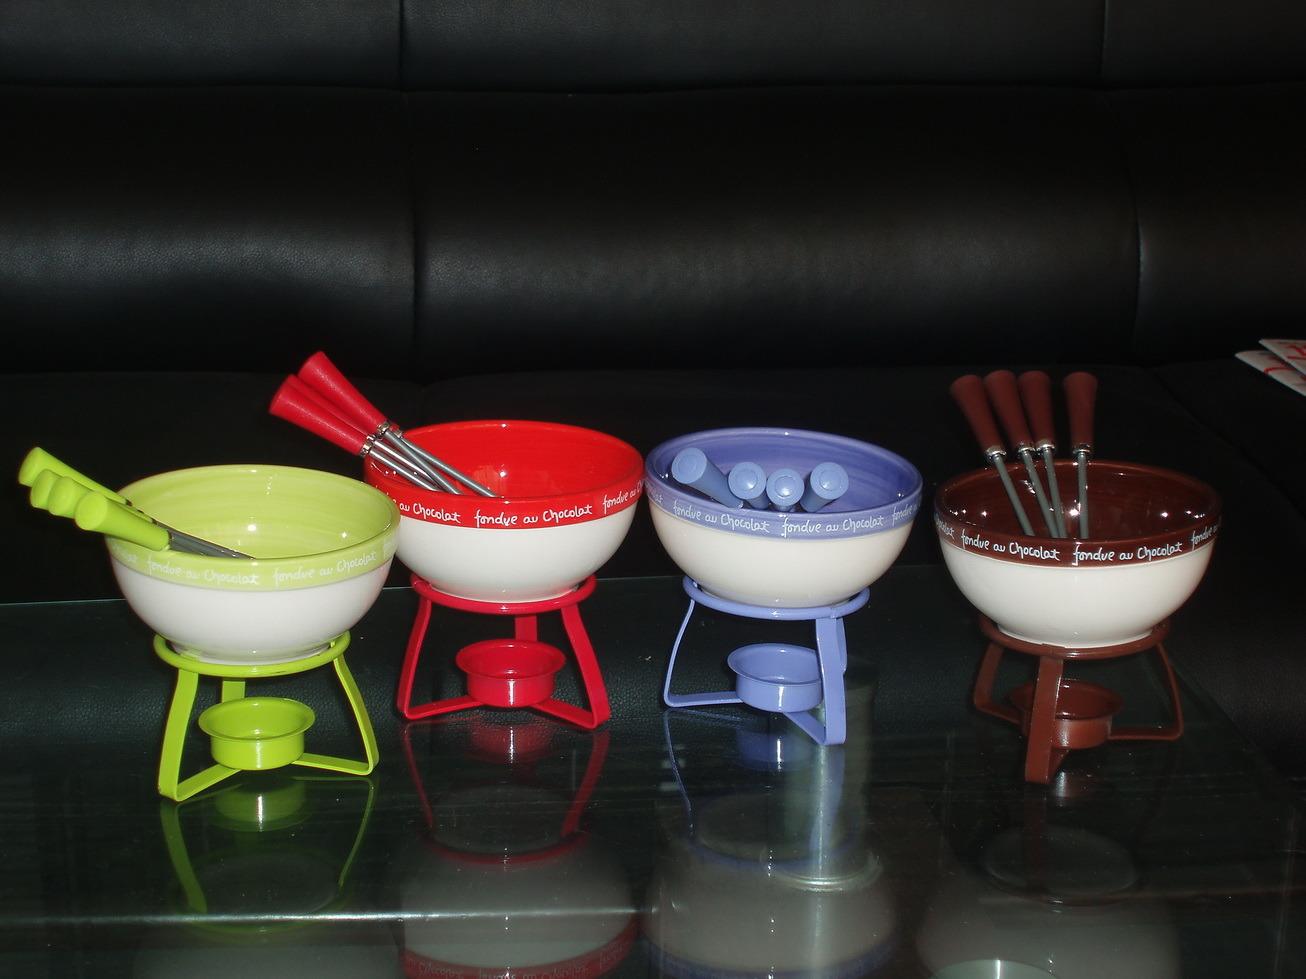 china chocolate fondue set b16 china chocolate fondue fondue set. Black Bedroom Furniture Sets. Home Design Ideas